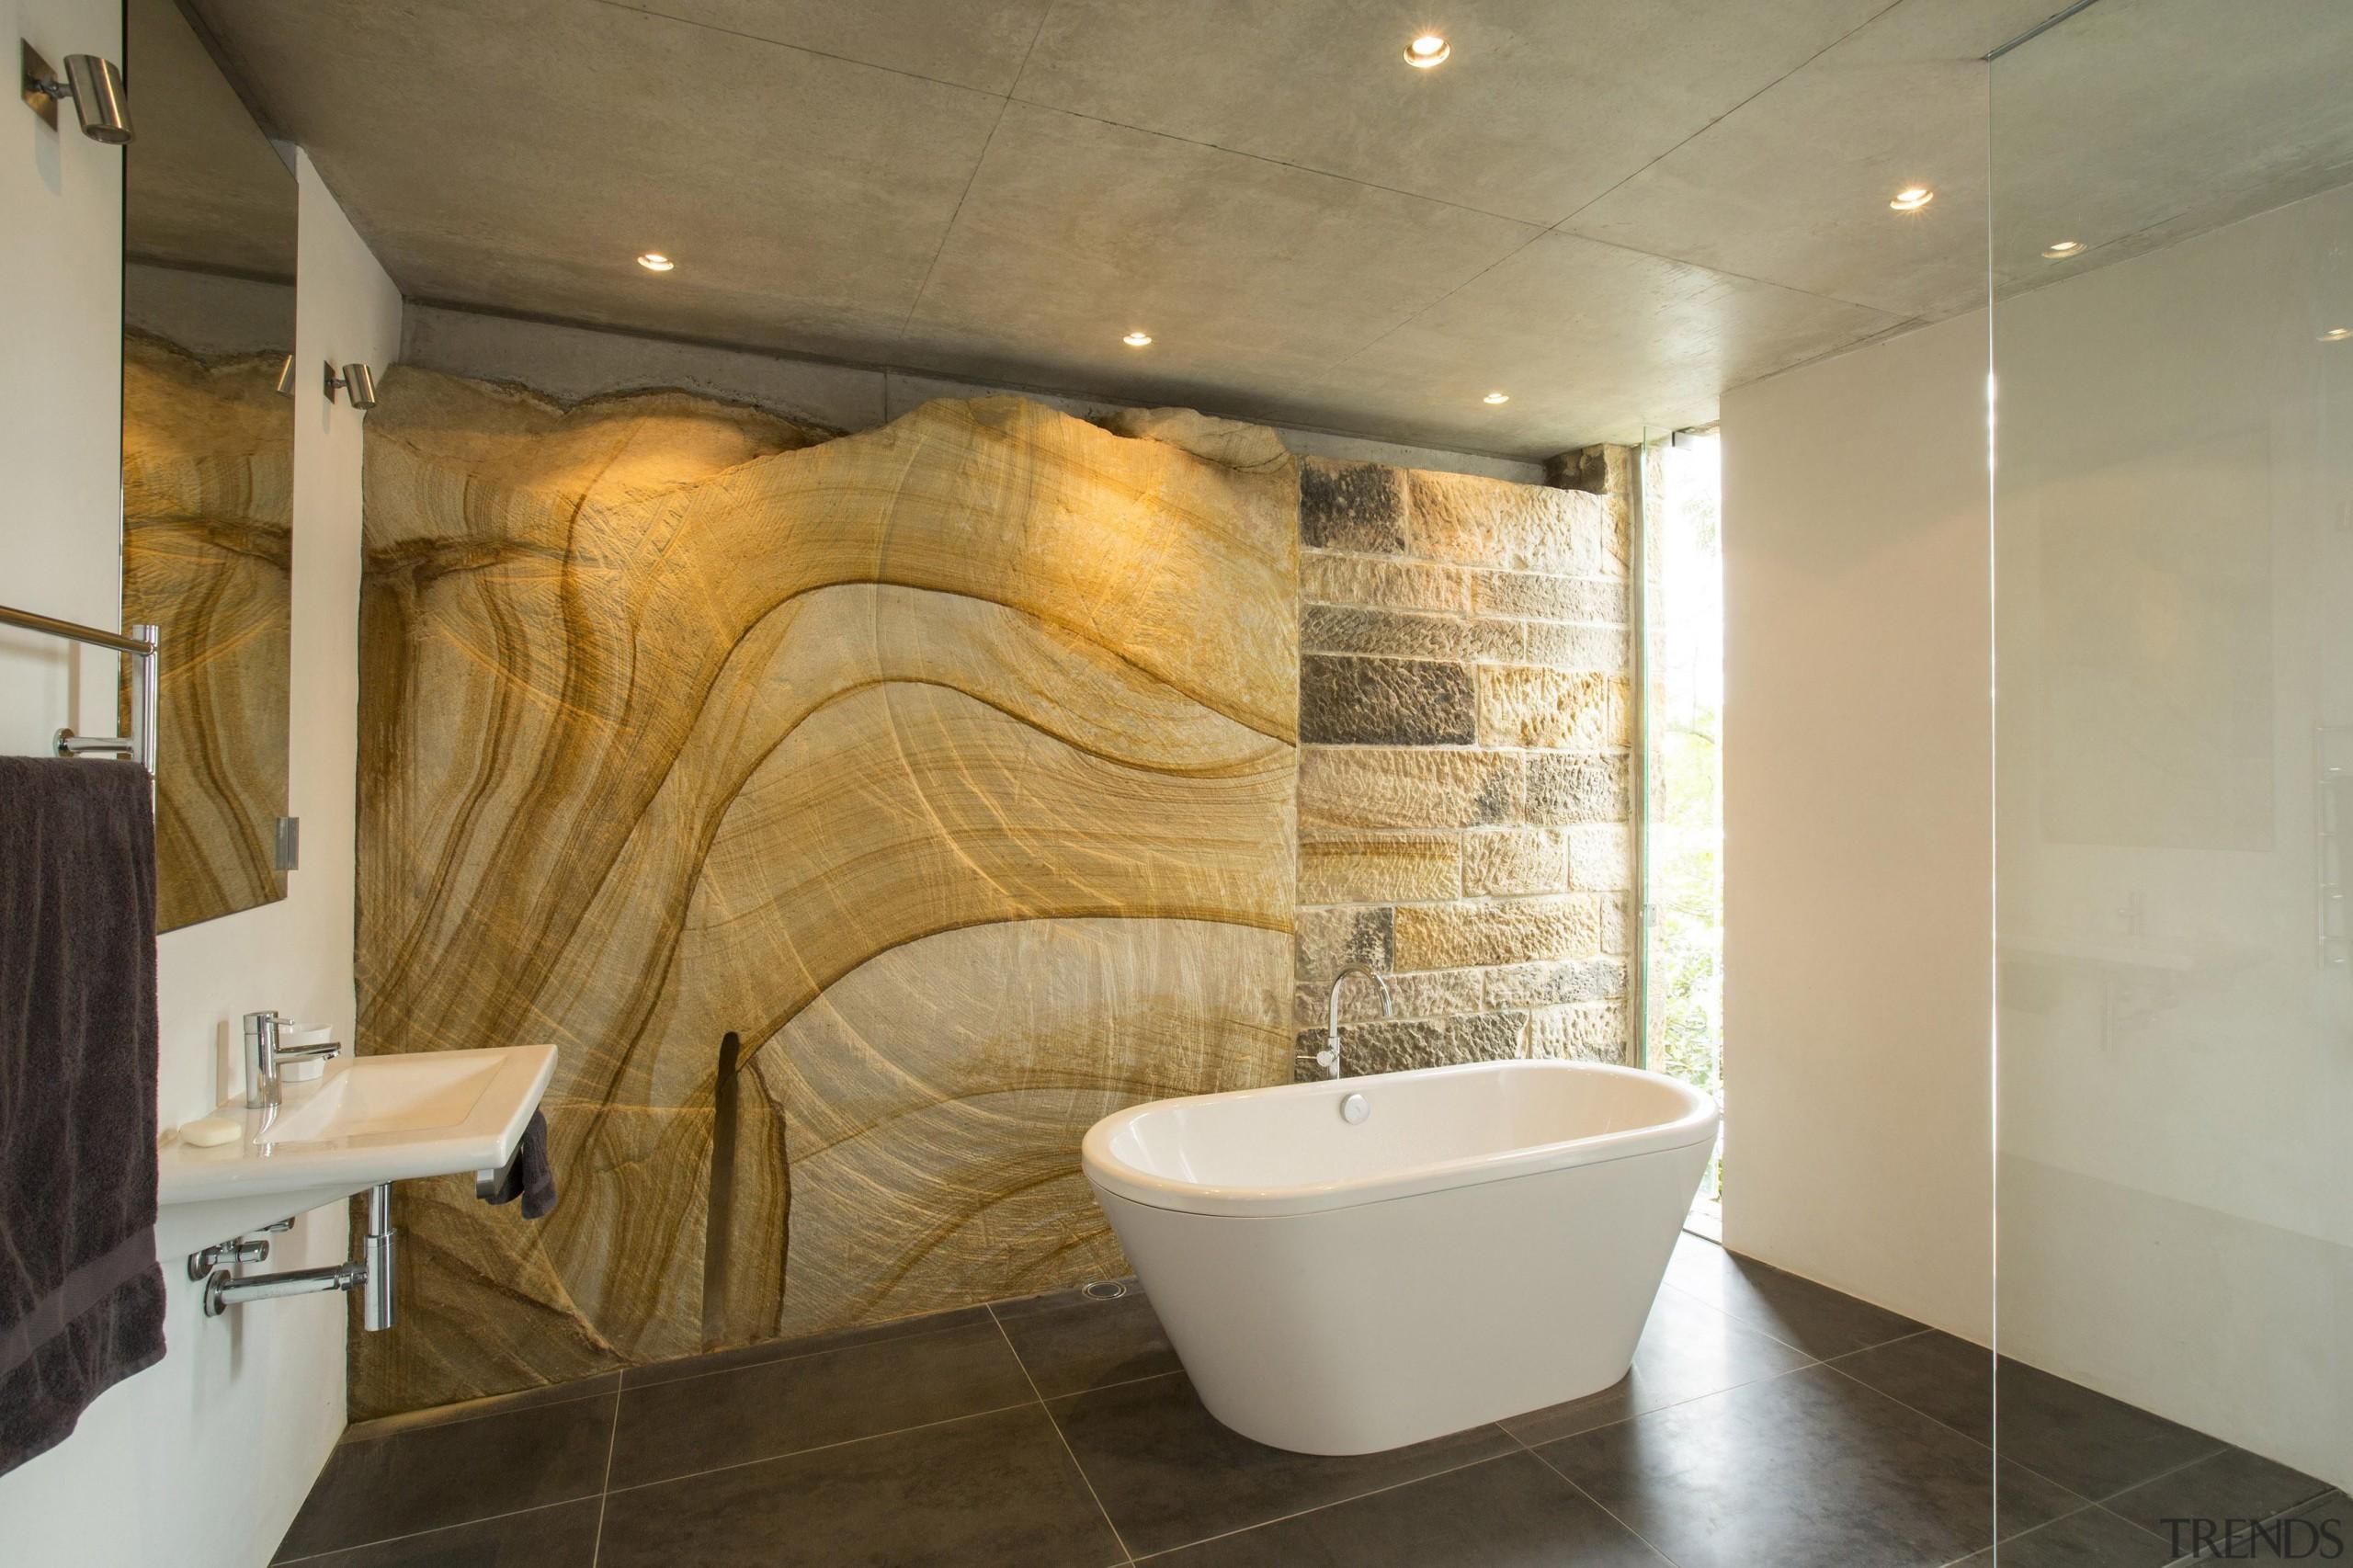 Winner Bathroom of the Year 2013 New South bathroom, ceiling, floor, flooring, interior design, property, real estate, room, tile, wall, brown, orange